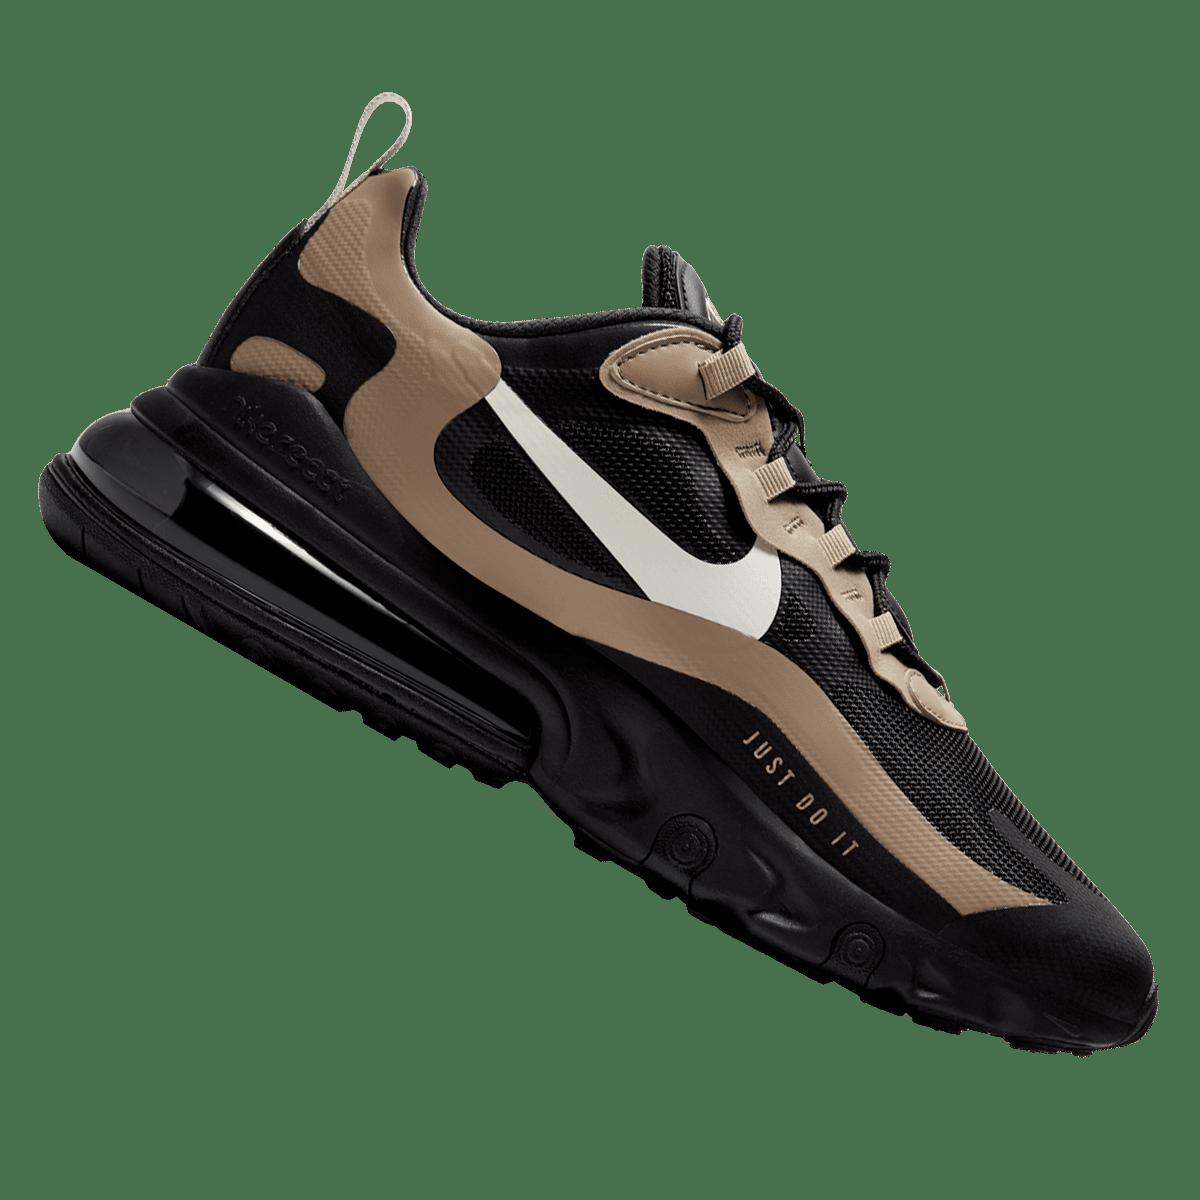 Nike Freizeitschuh Air Max 270 React schwarzgold